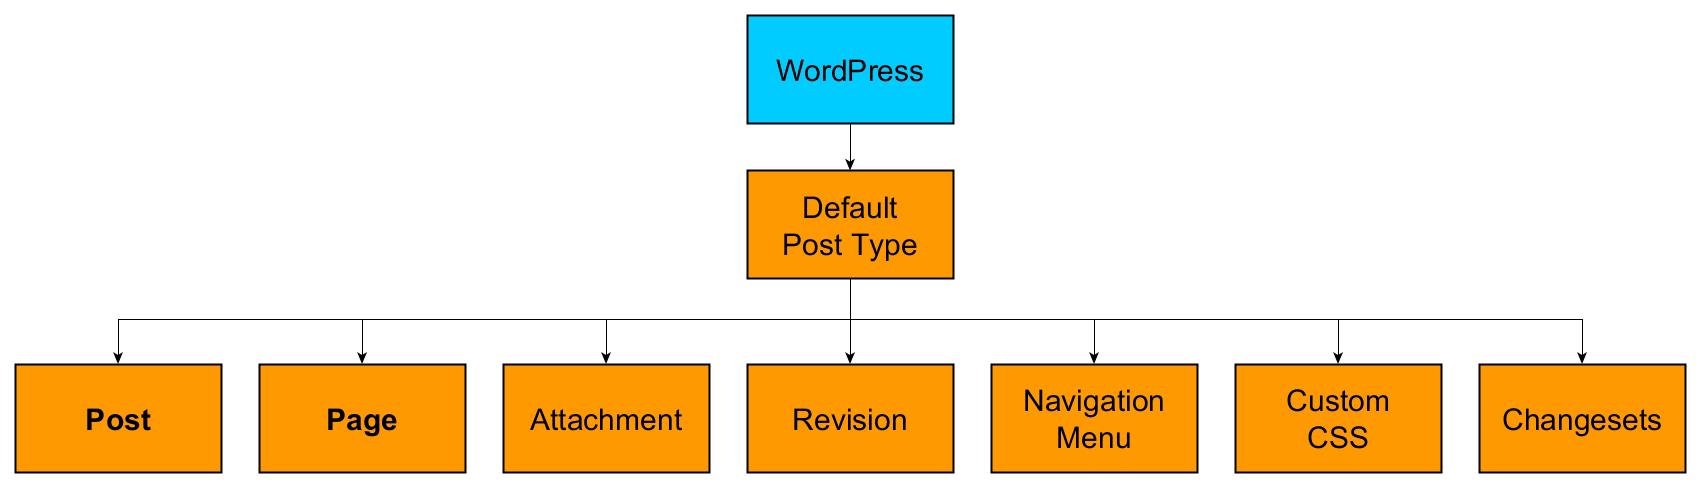 WordPress default post types